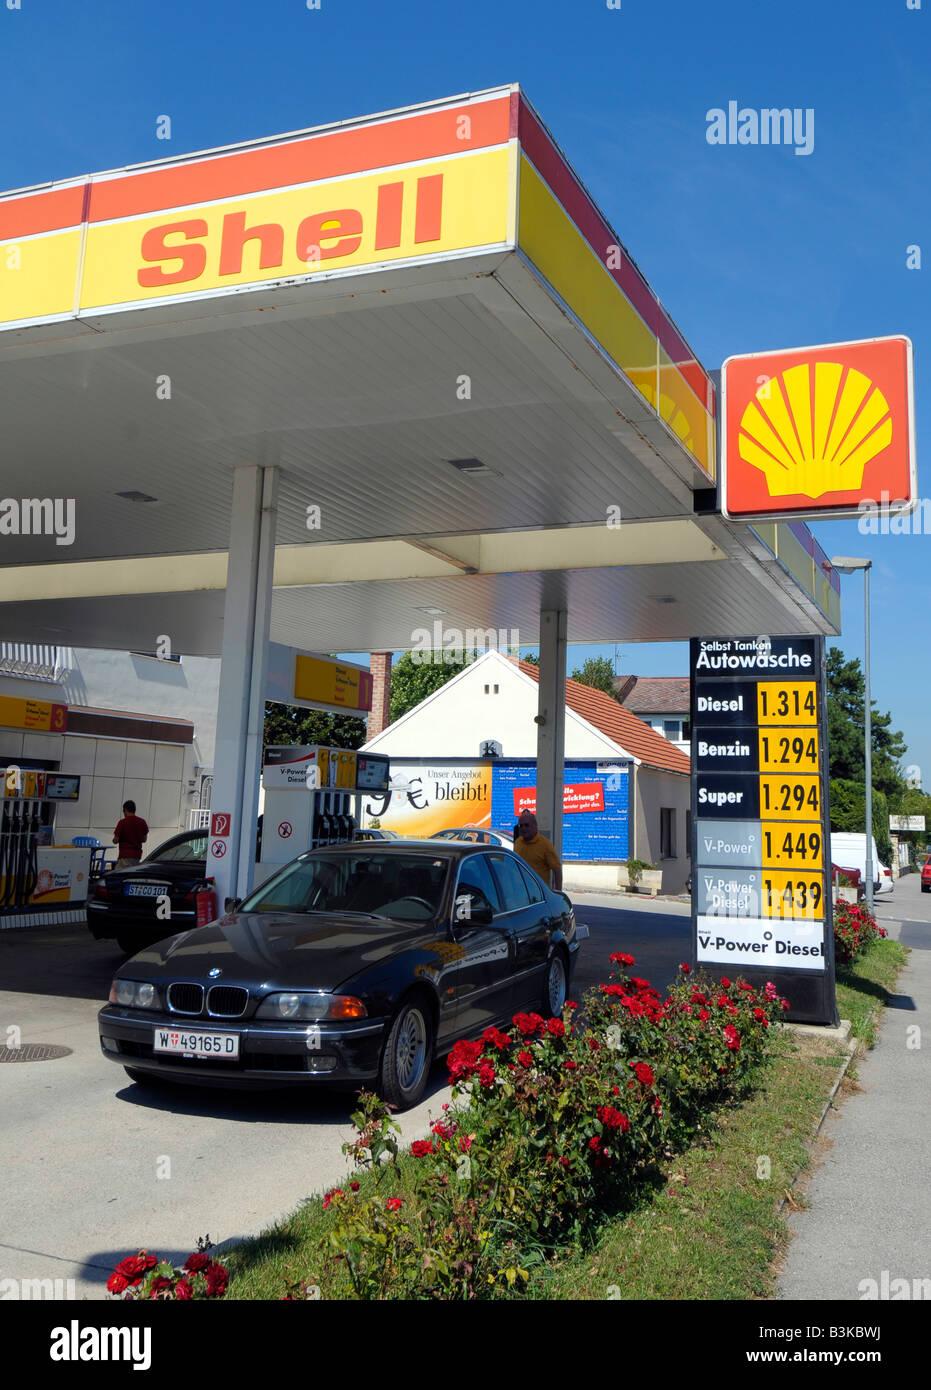 Gasolinera Shell, Austria Imagen De Stock